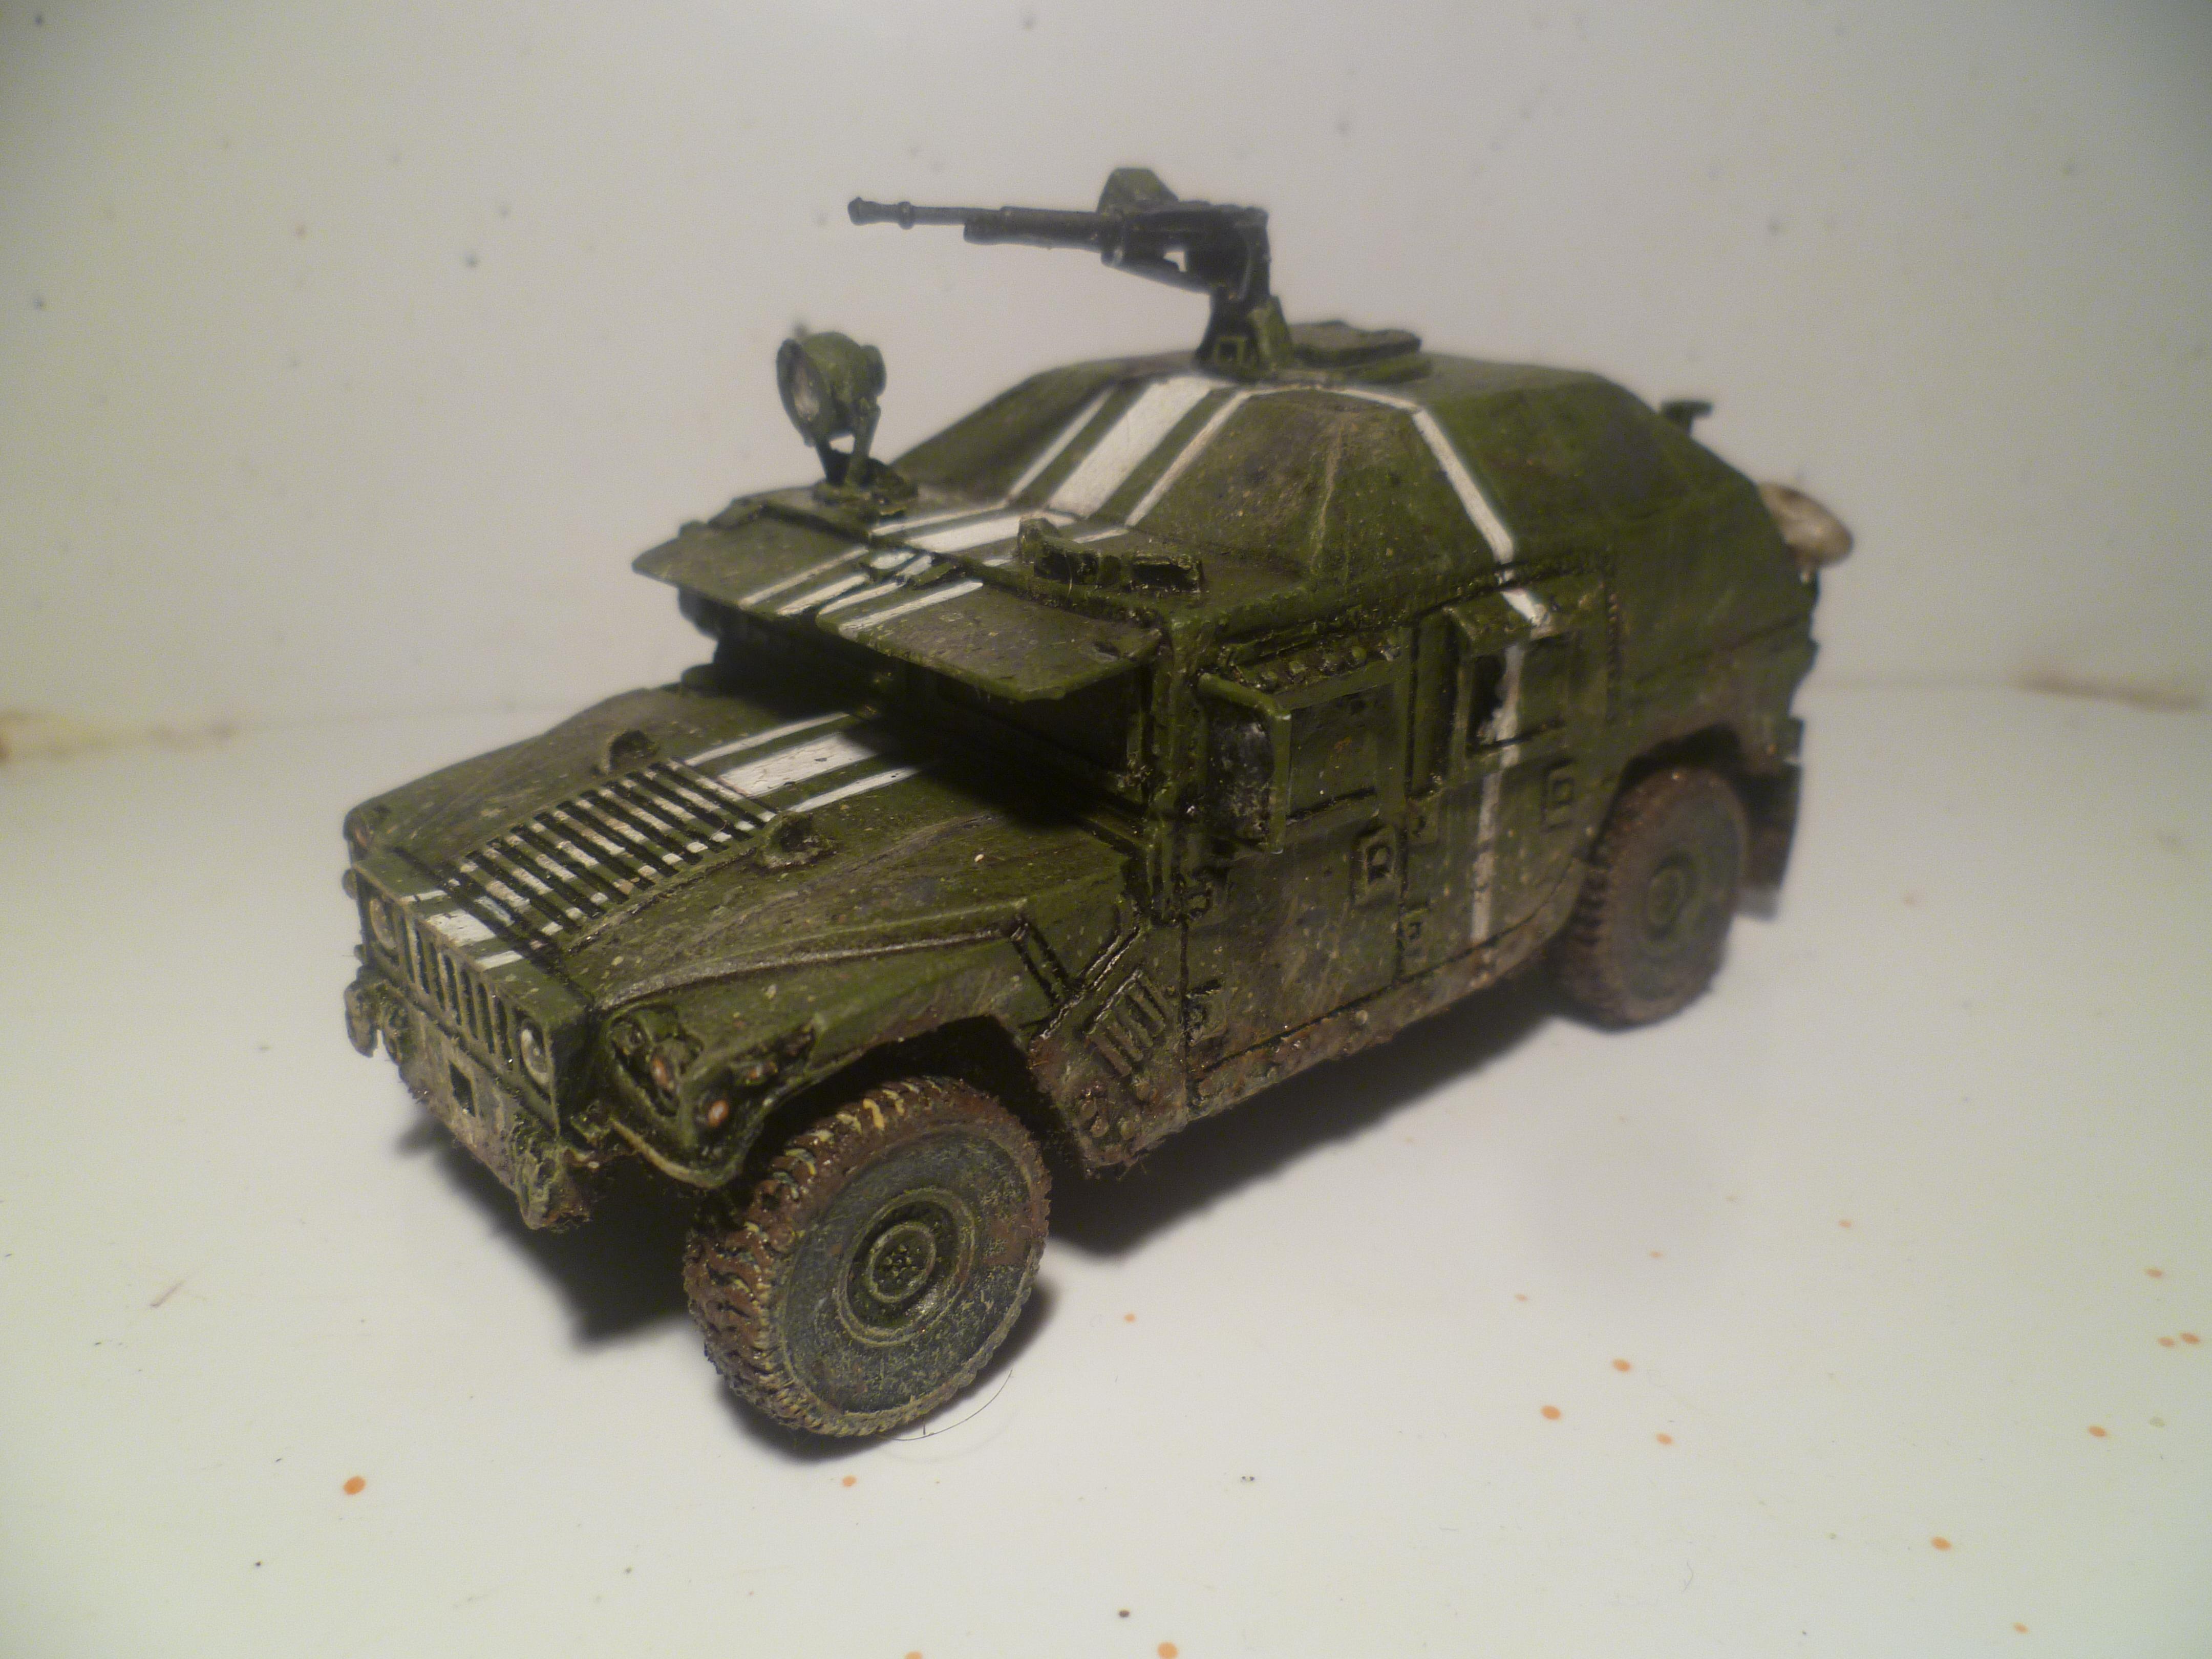 1/50, 28mm, Conversion, Eastern European, Hummer, Humvee, Modern, Russians, Ukrainian, Vehicle